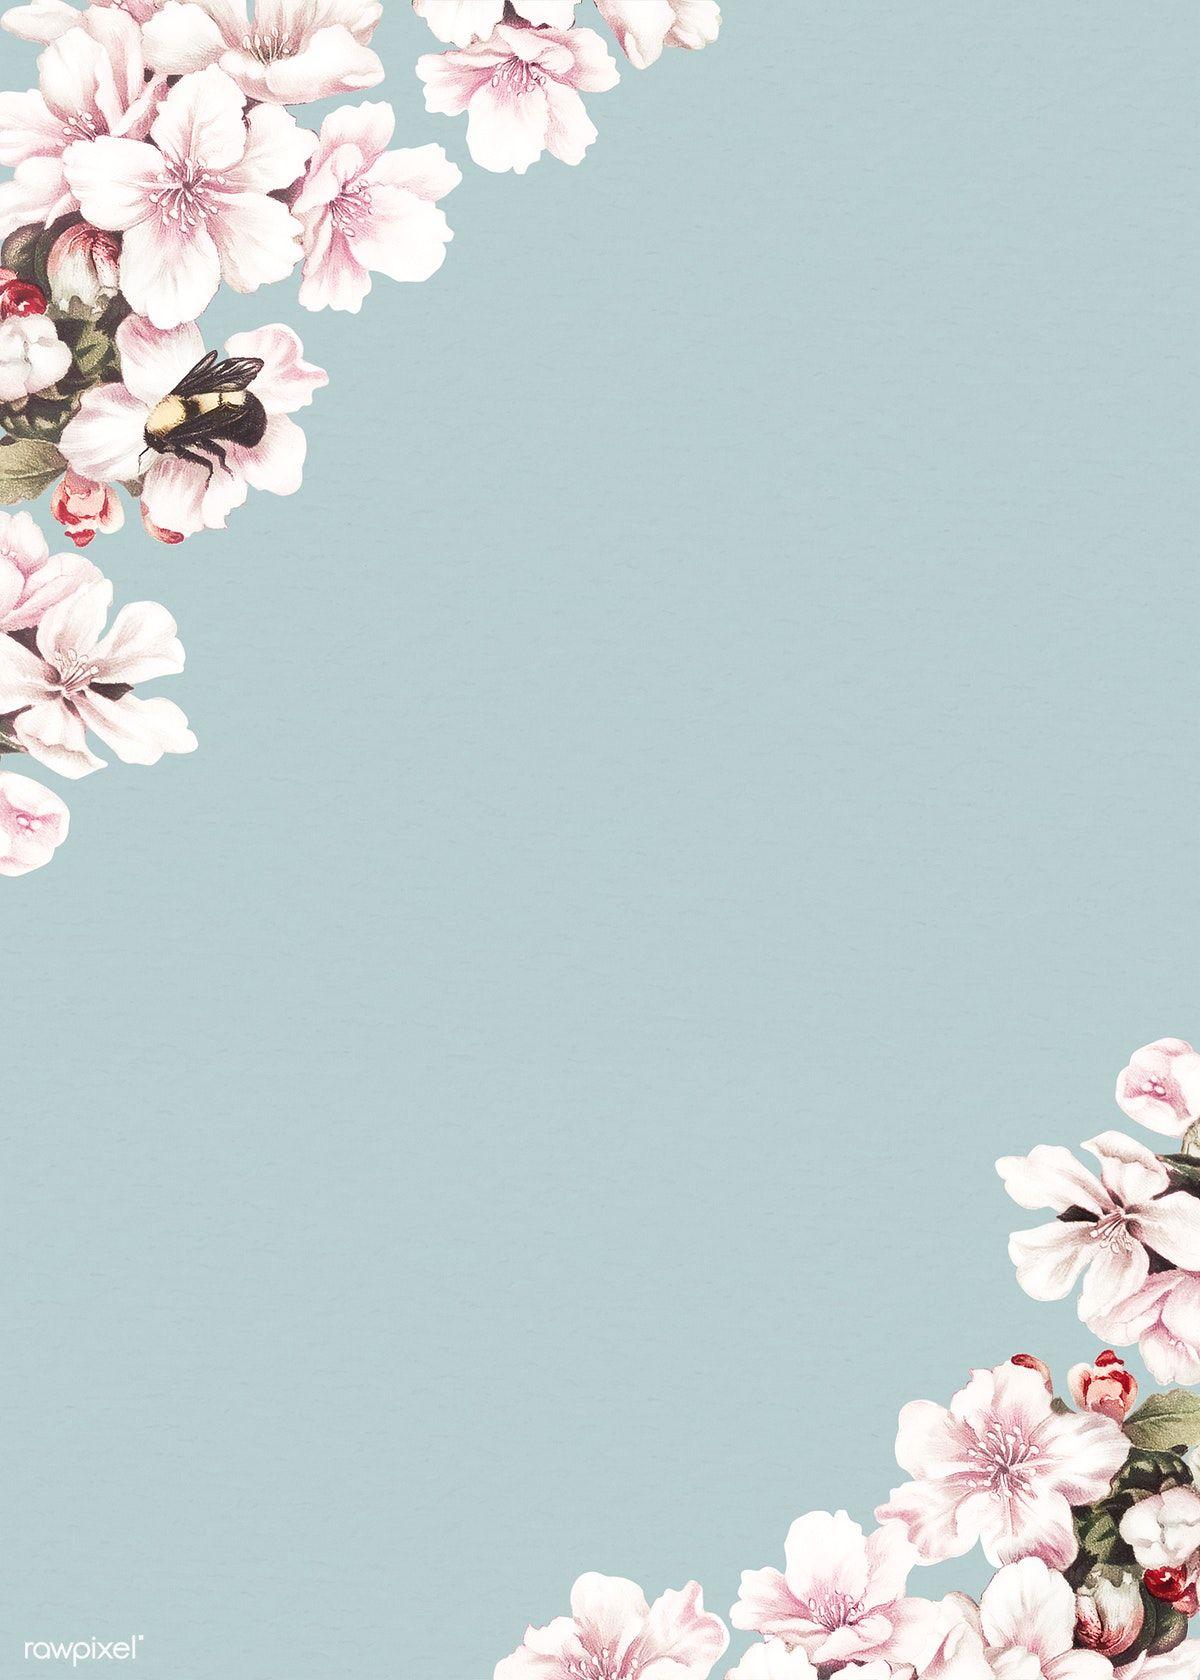 Blank Blooming Floral Card Design Free Image By Rawpixel Com Vector Vectoart Digitalpainting Digitalartist Floral Cards Design Floral Cards Card Design